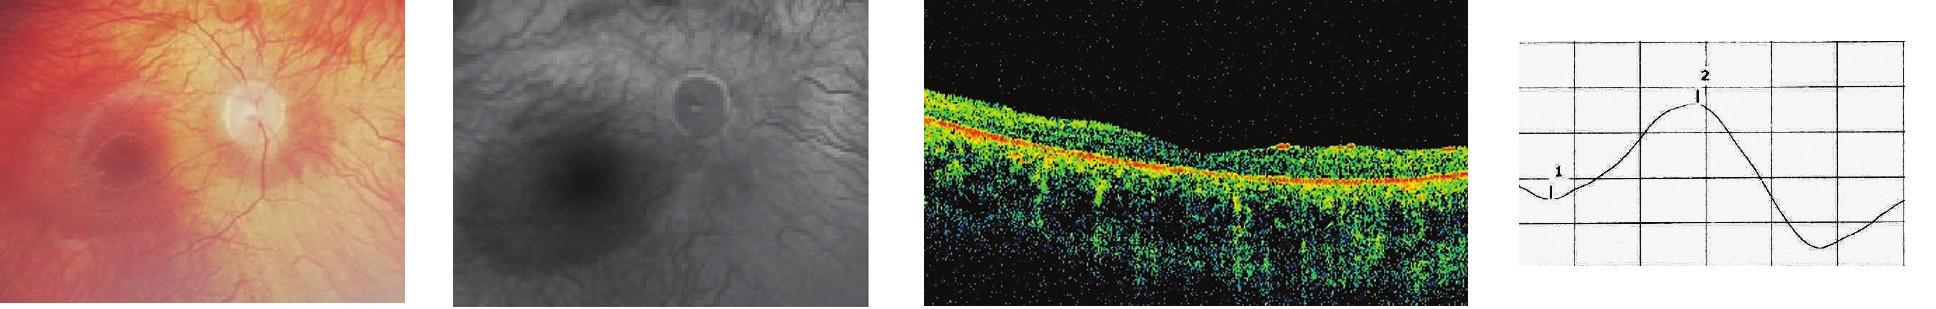 Difúzna forma TRD 5a Oftalmoskopický nález, 5b FAG nález, 5c Obraz OCT, 5d Záznam ERG